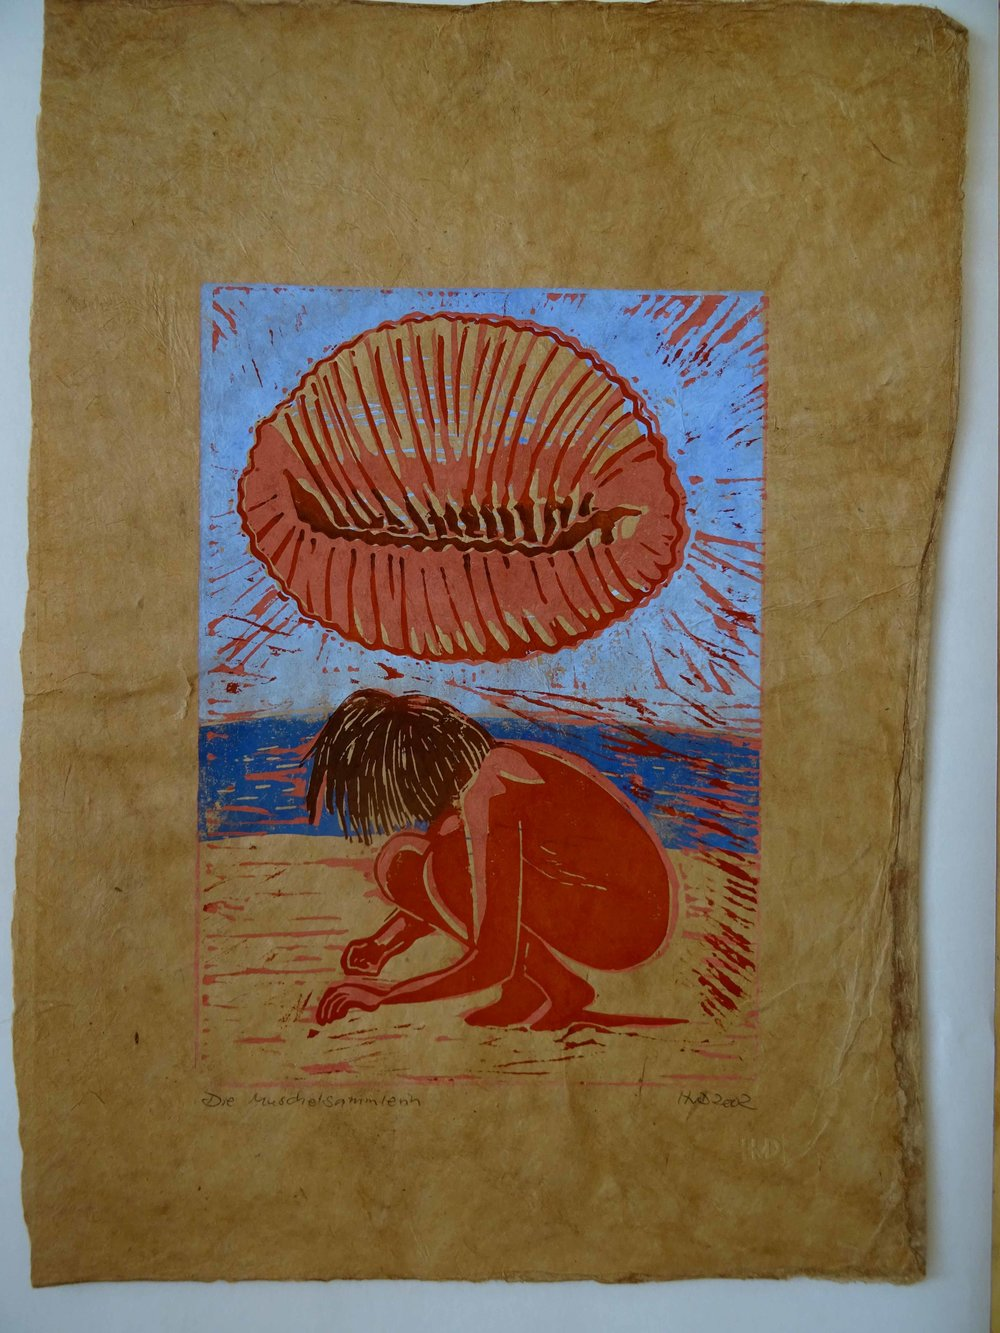 58 Muschelsammlerin, 30x21 cm, 4-plate lino on himalaya paper, 80 €